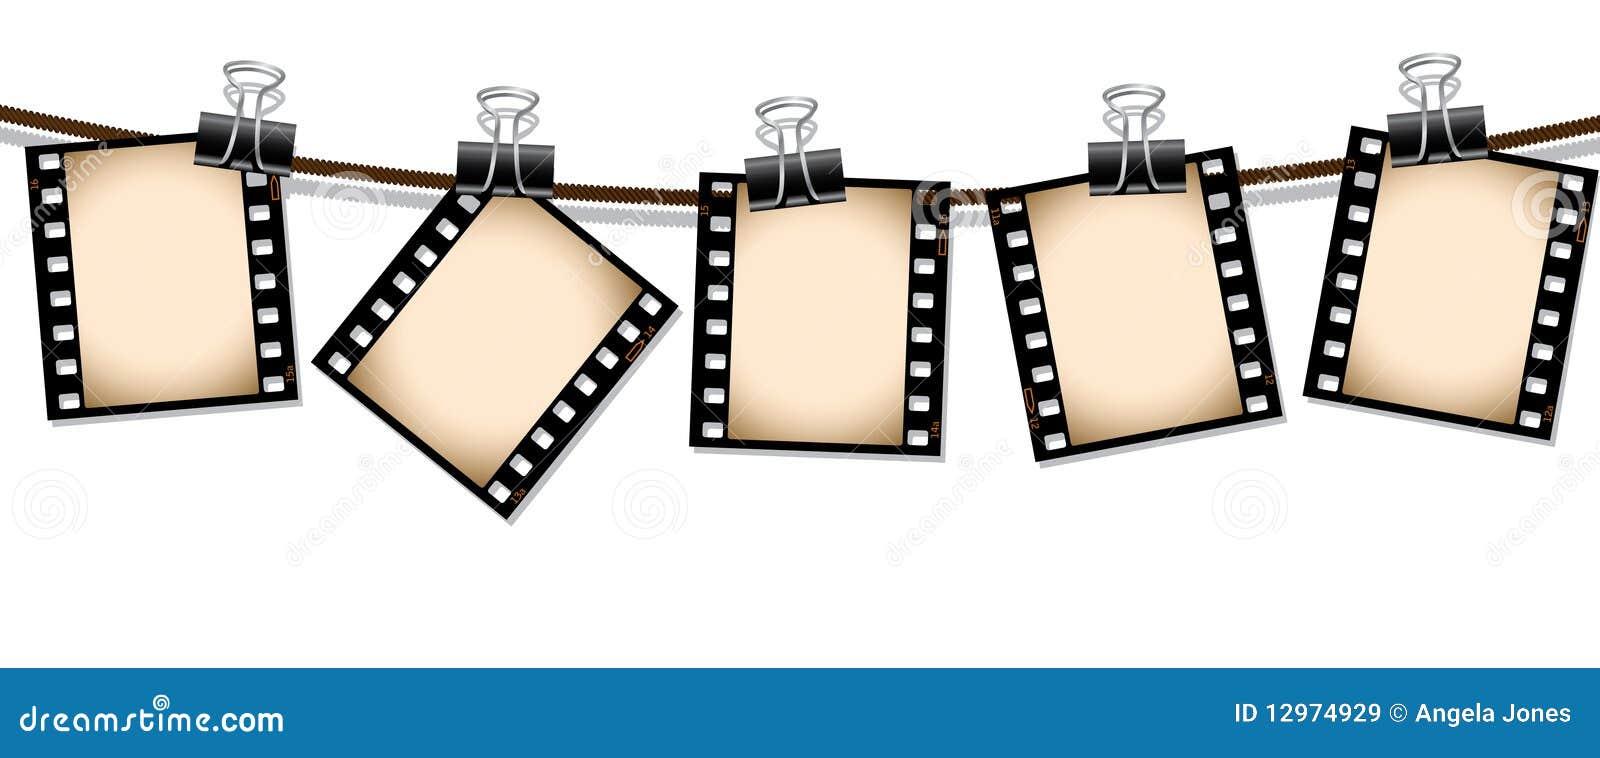 clipart pellicola cinematografica - photo #25